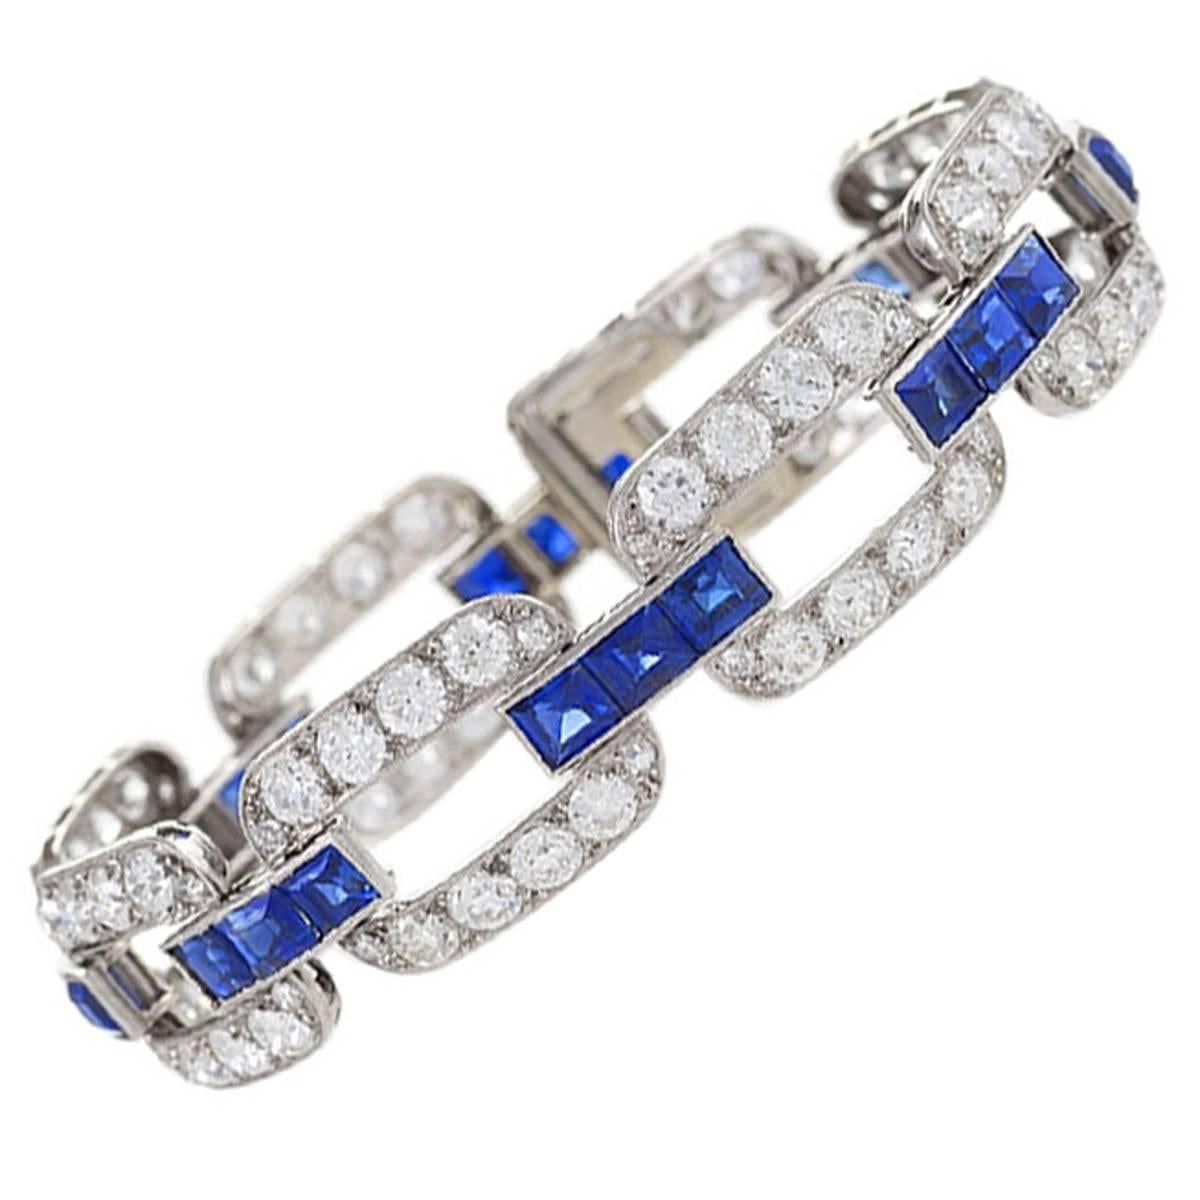 French 1930s Art Deco Sapphire Diamond Gold Platinum Link Bracelet